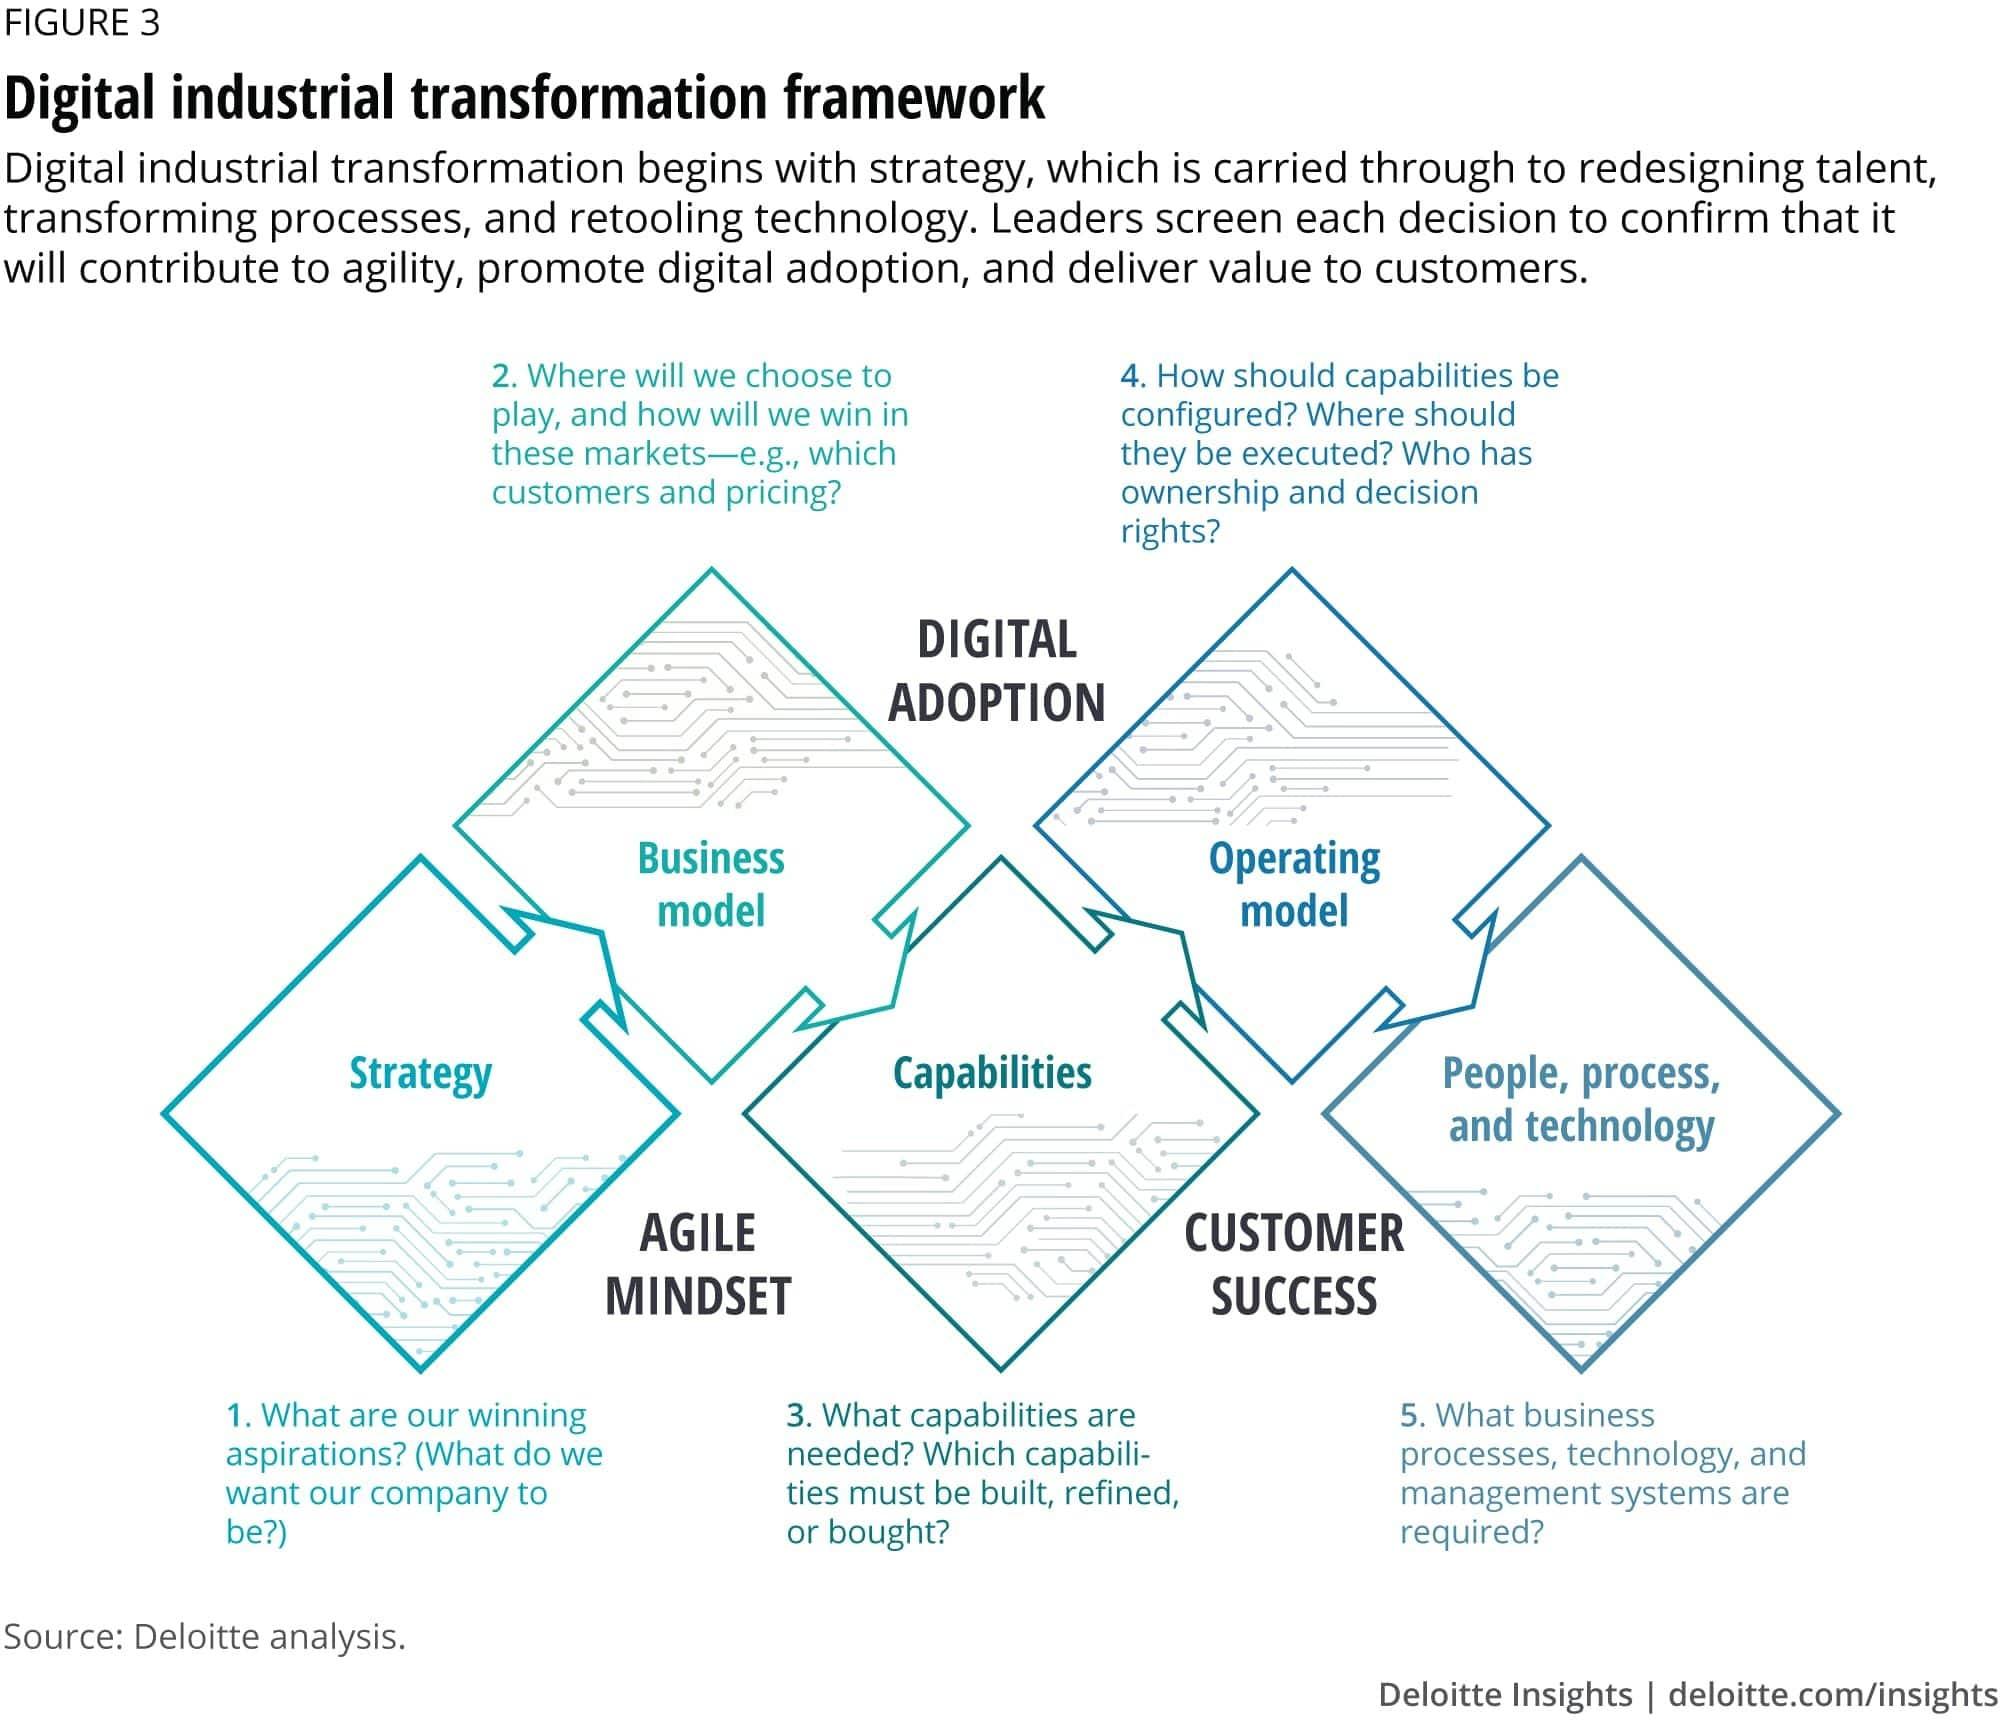 Fig.1: Deloitte Digital Industrial Transformation Framework. (source: Architecting an Operating Model)